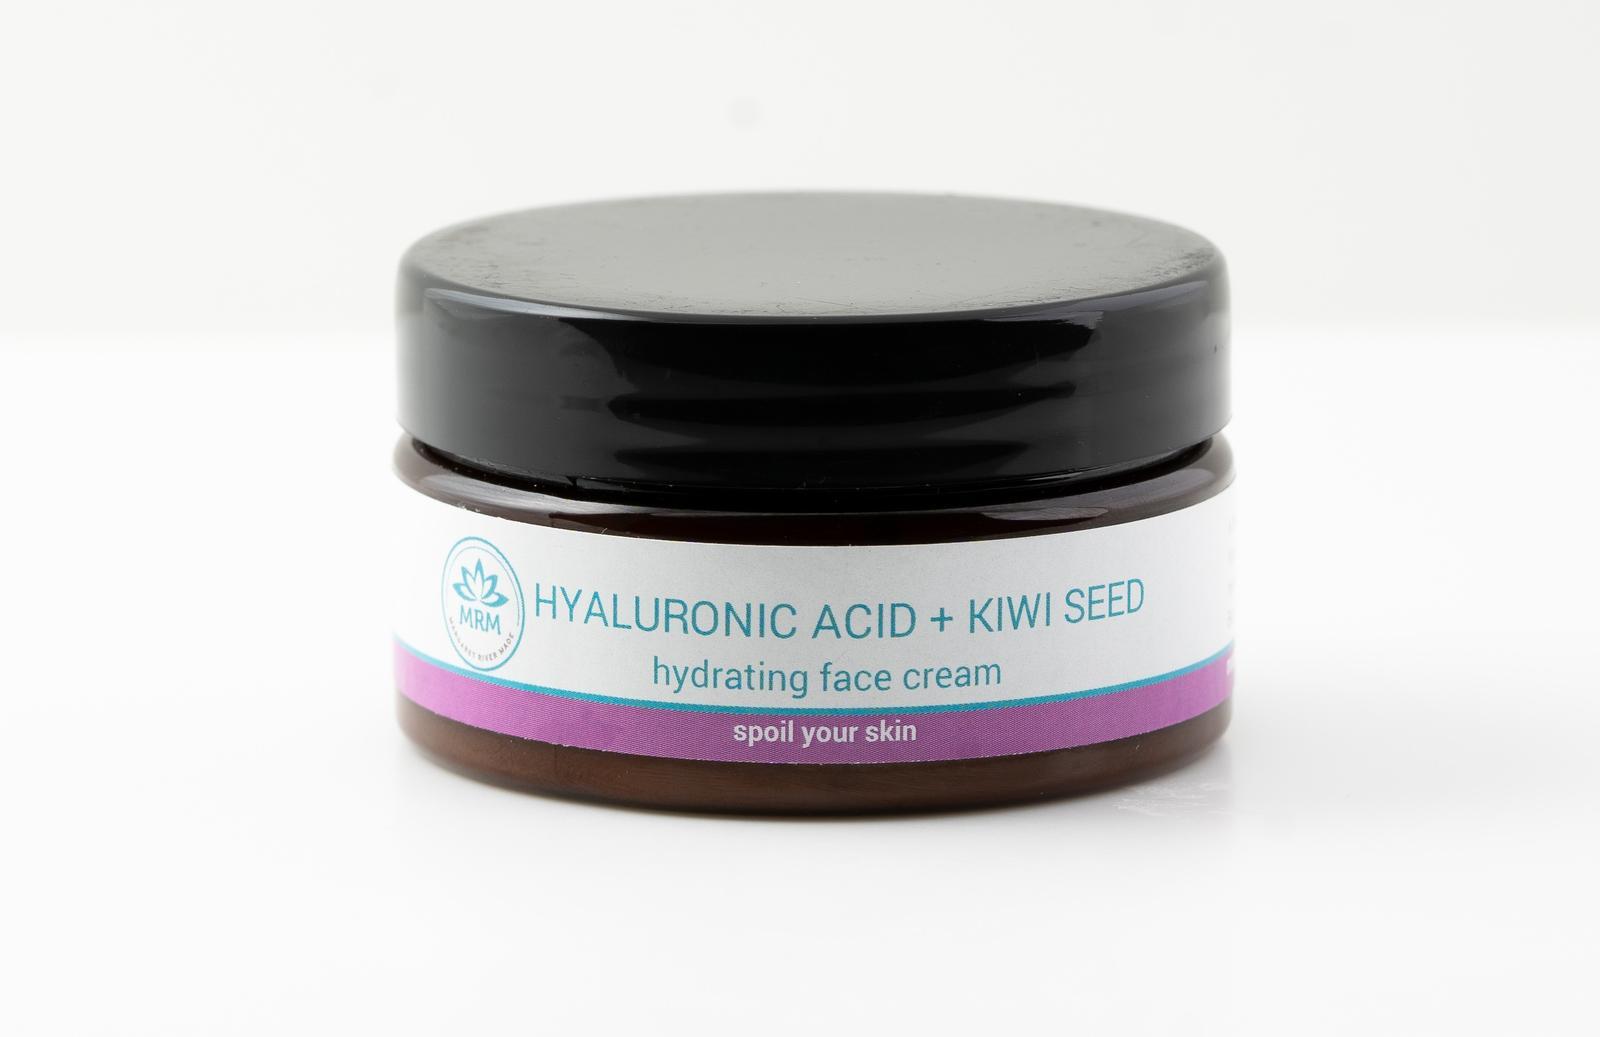 Hyaluronic Acid & Kiwi Seed Face Cream